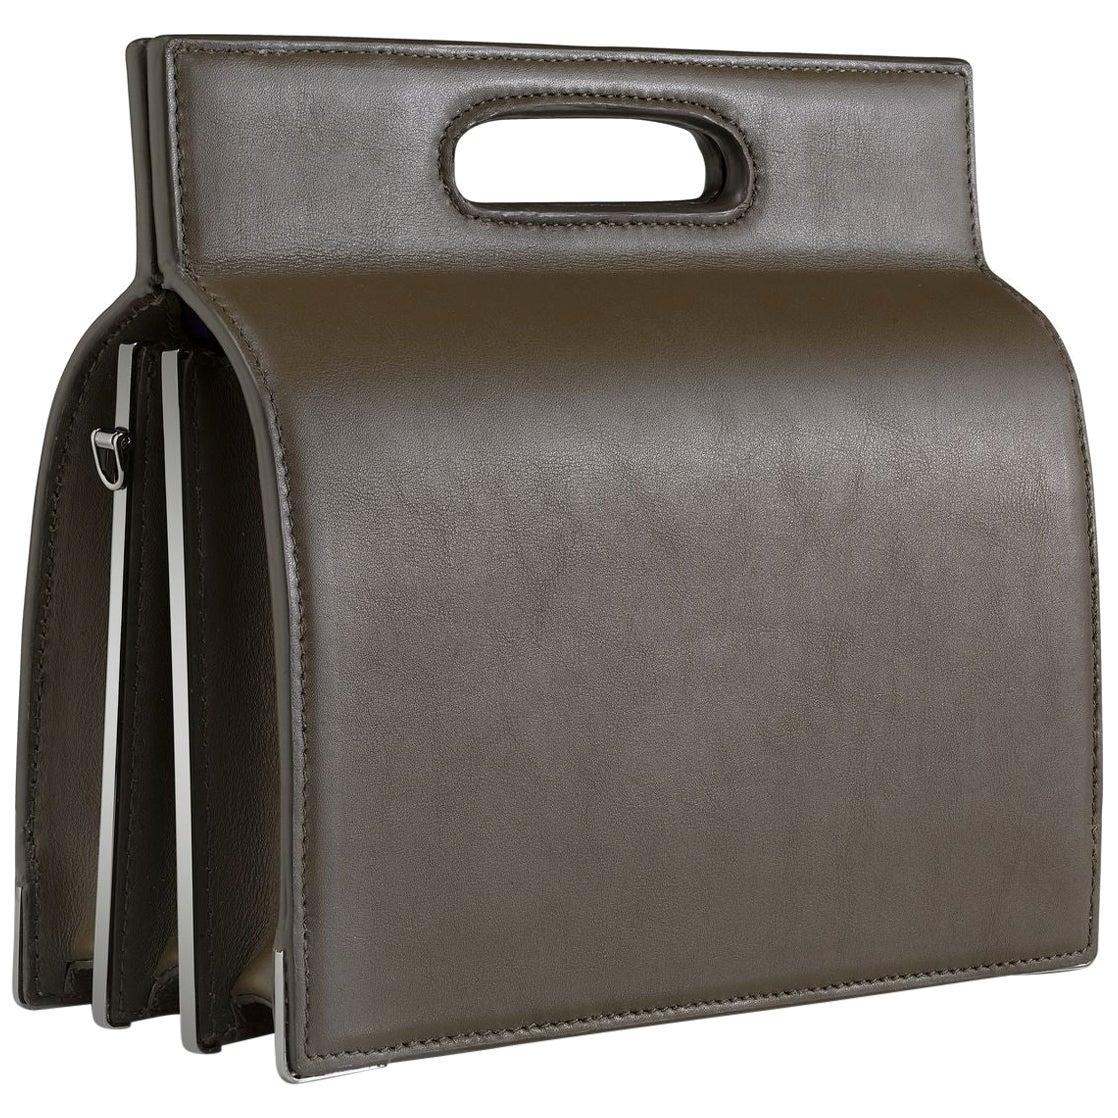 TYLER ELLIS Stella Handbag Tall Olive Green Leather Gunmetal Hardware